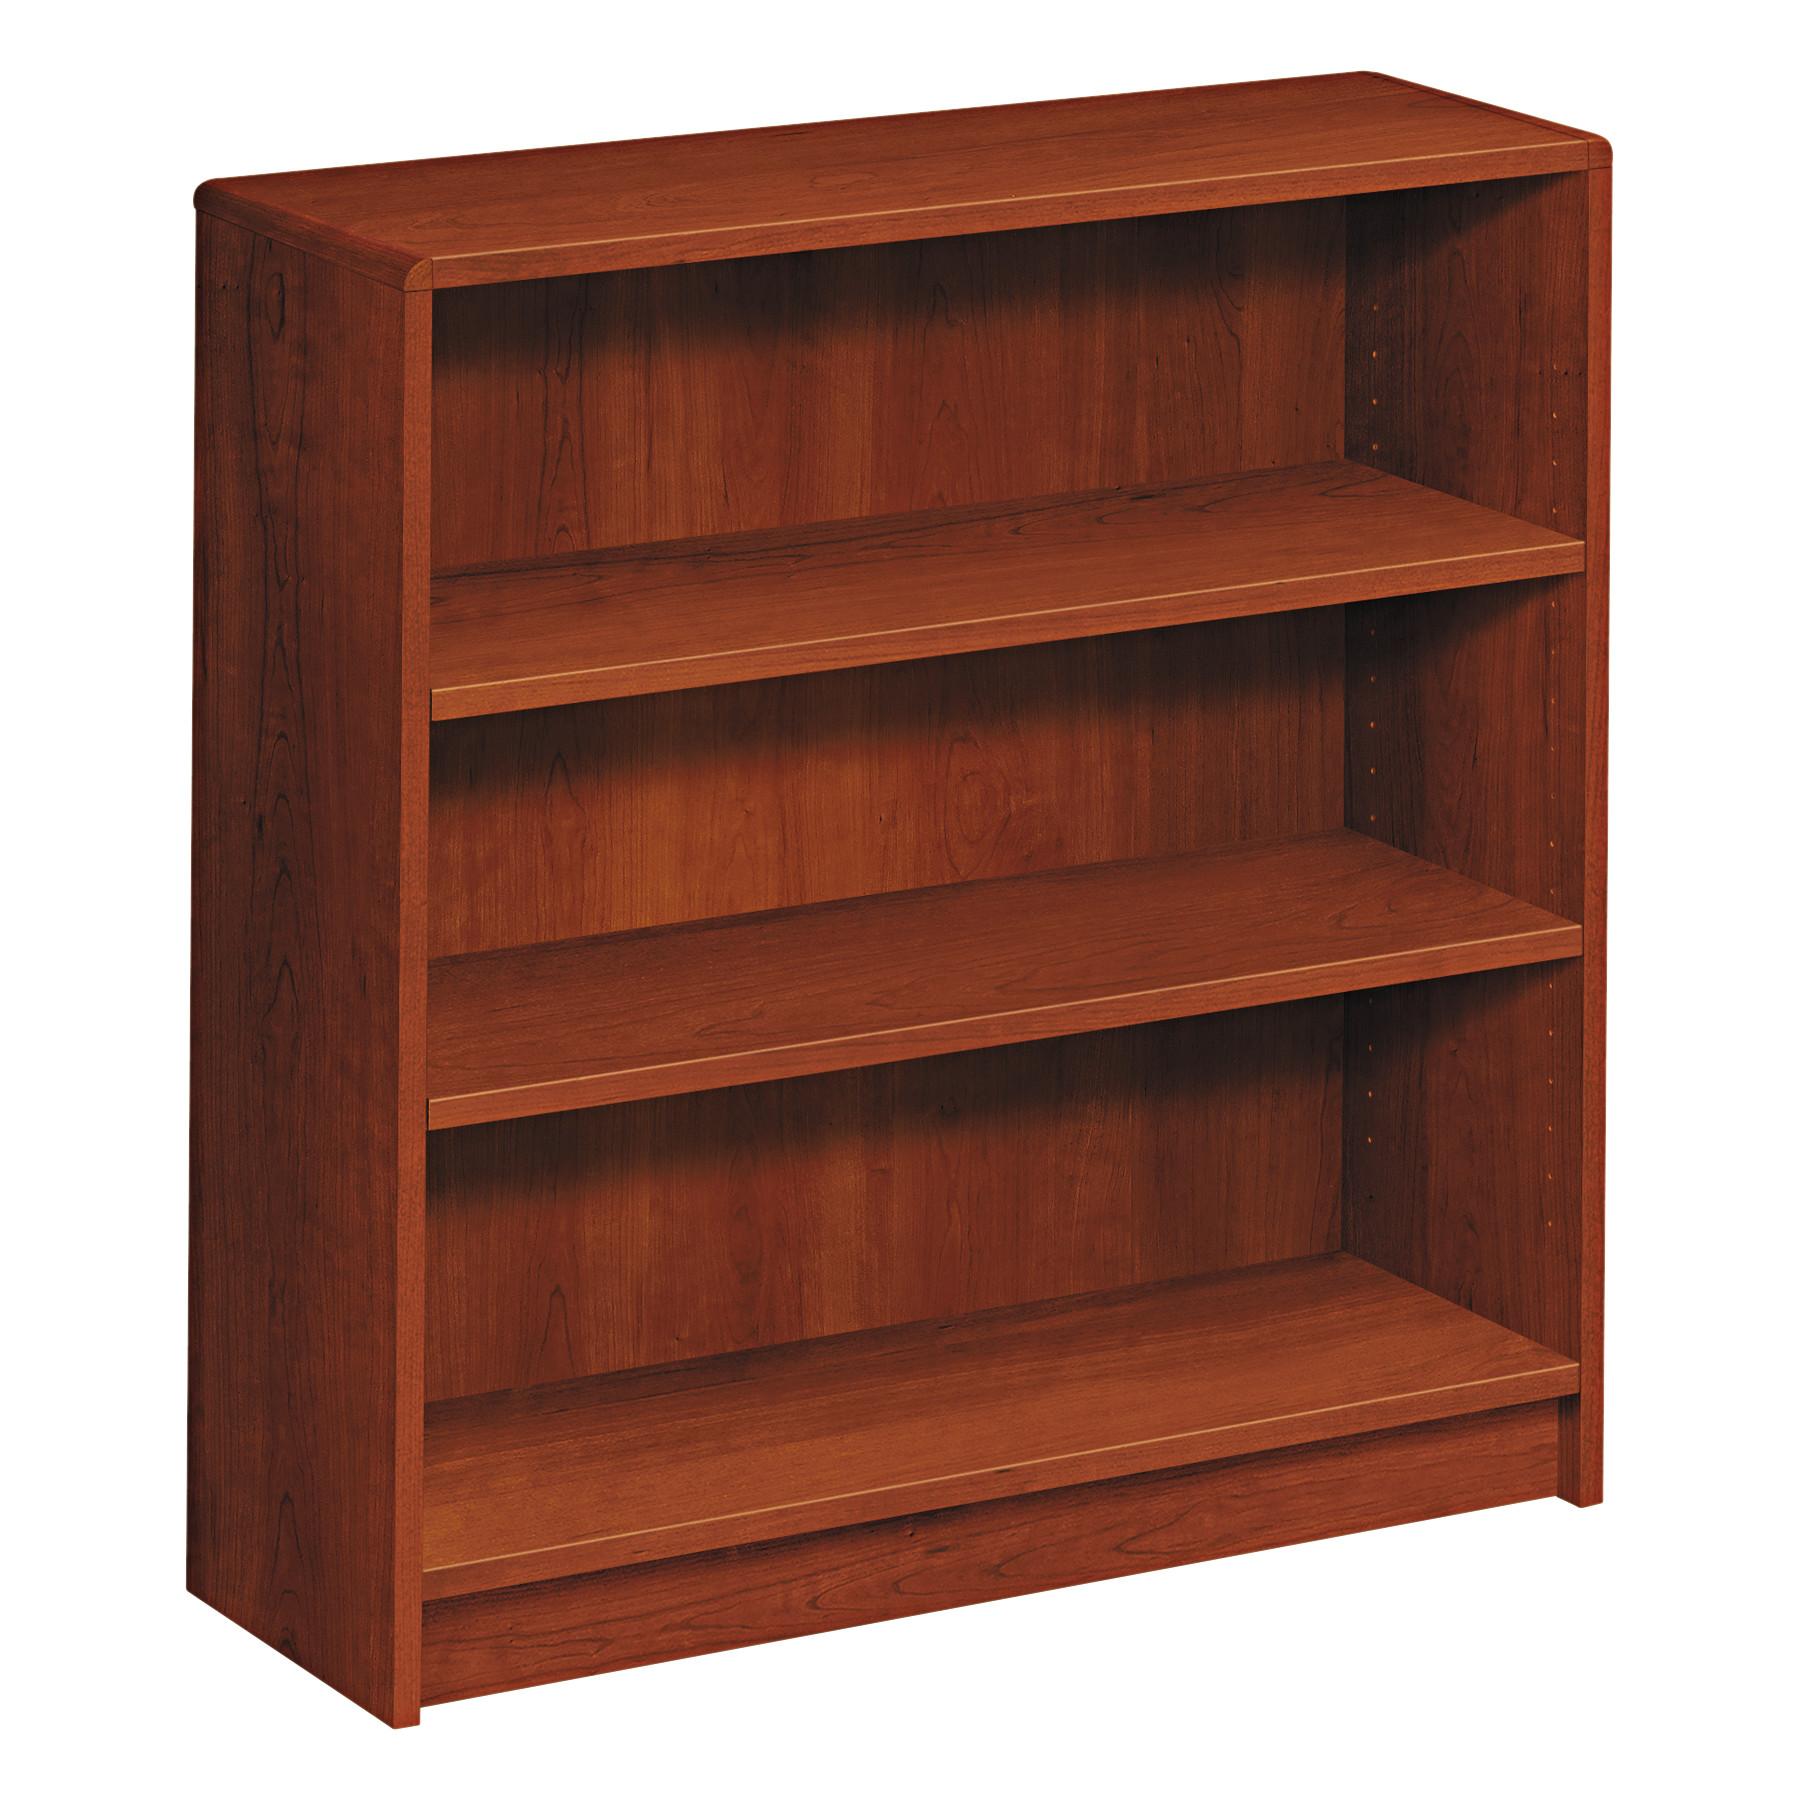 HON 1890 Series Bookcase, Three Shelf, 36w x 11 1/2d x 36 1/8h, Cognac